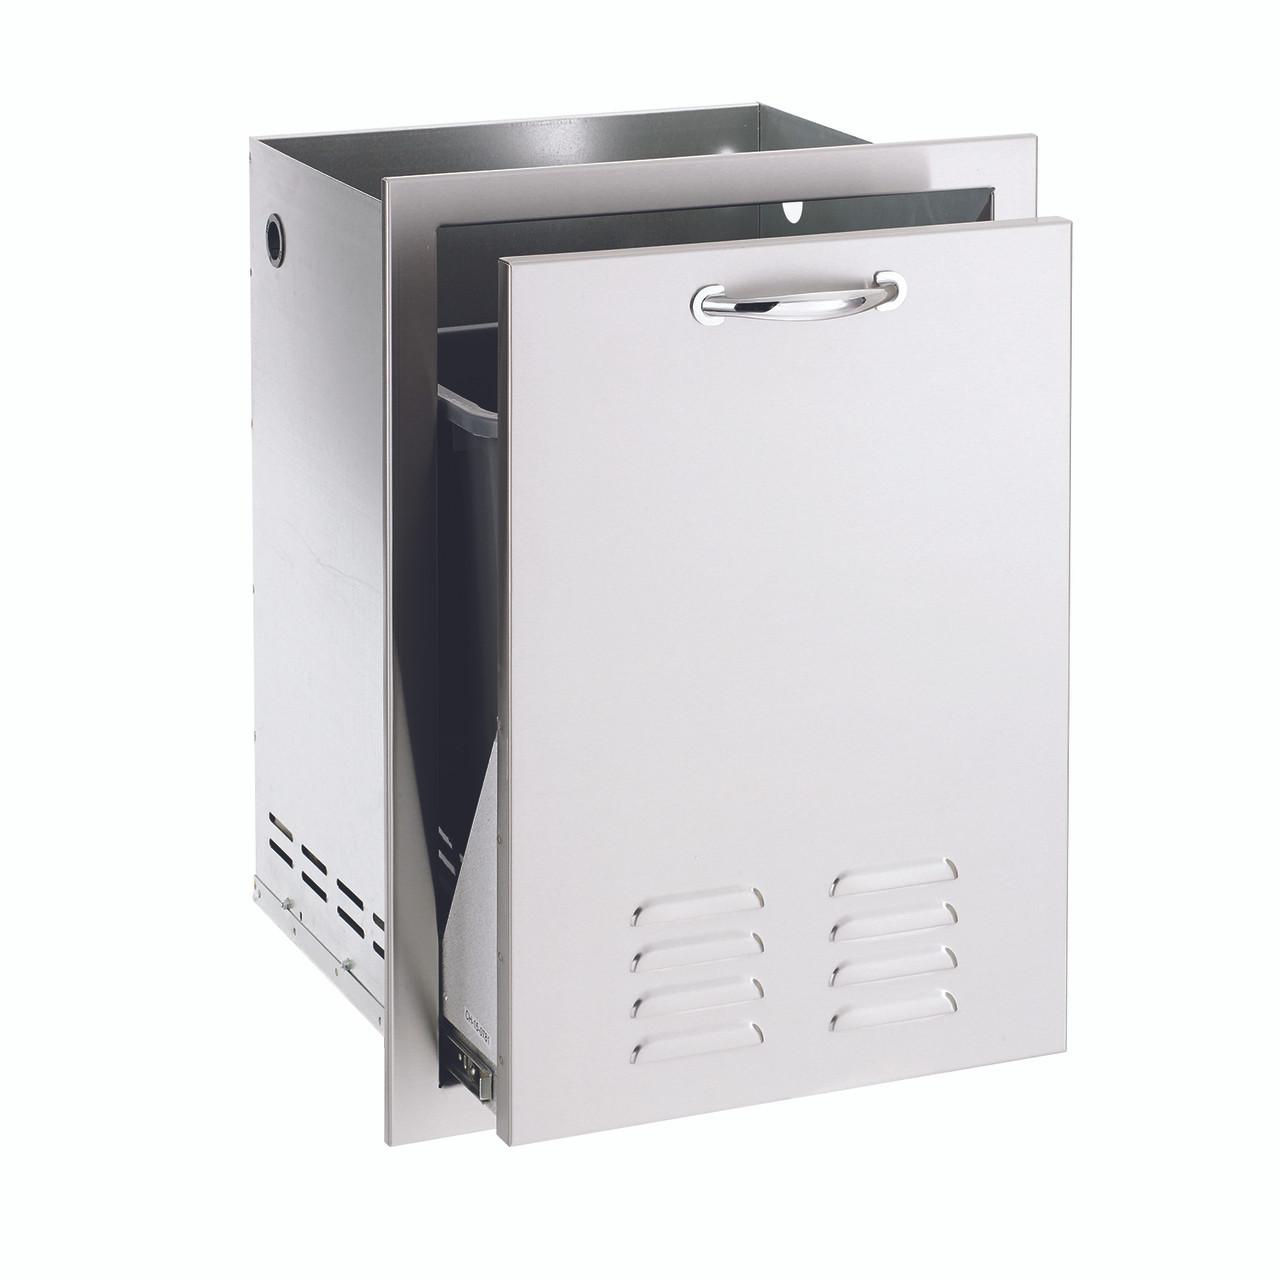 Summerset Trash Drawer - Storage Drawers - SSTD